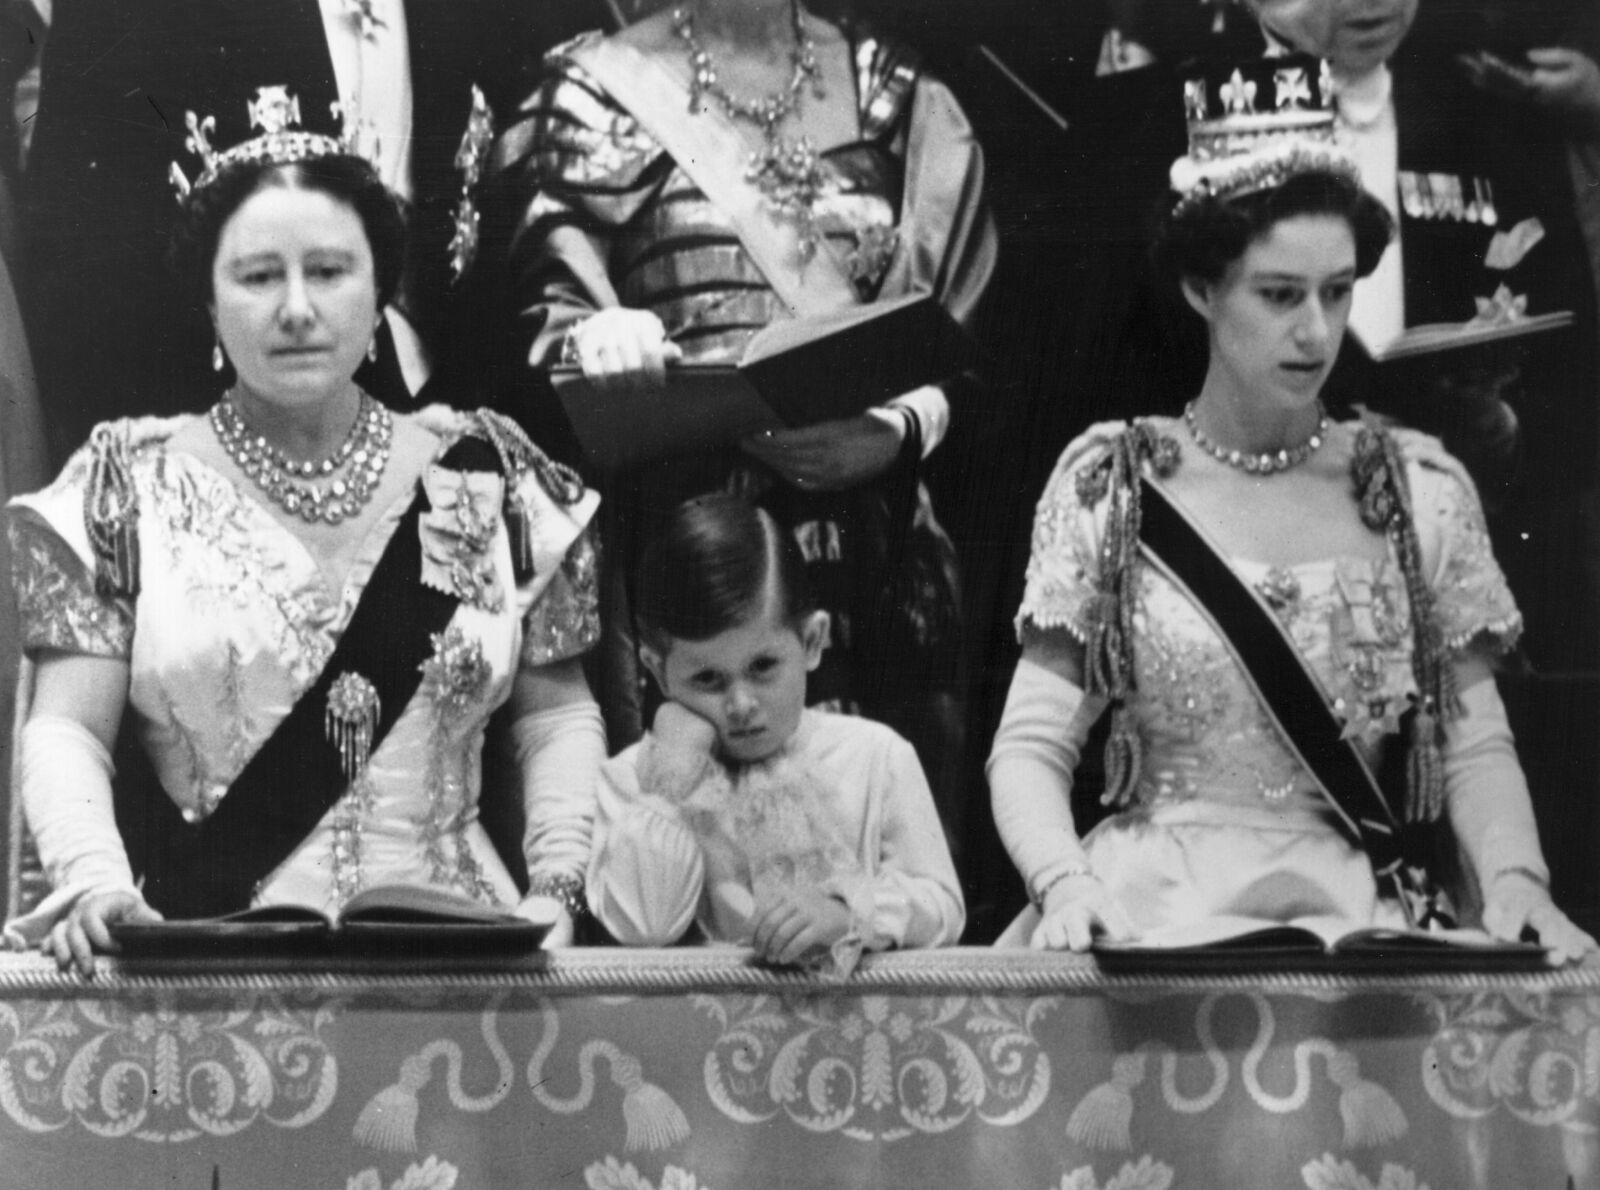 Coronation Boredom